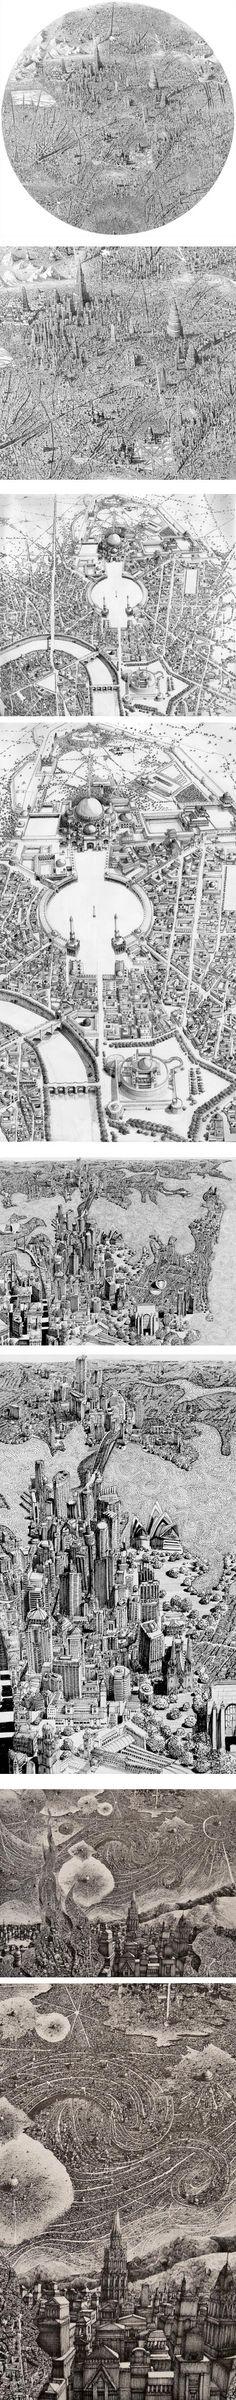 Benjamin Sack's incredibly detailed drawings of imaginary cityscapes.